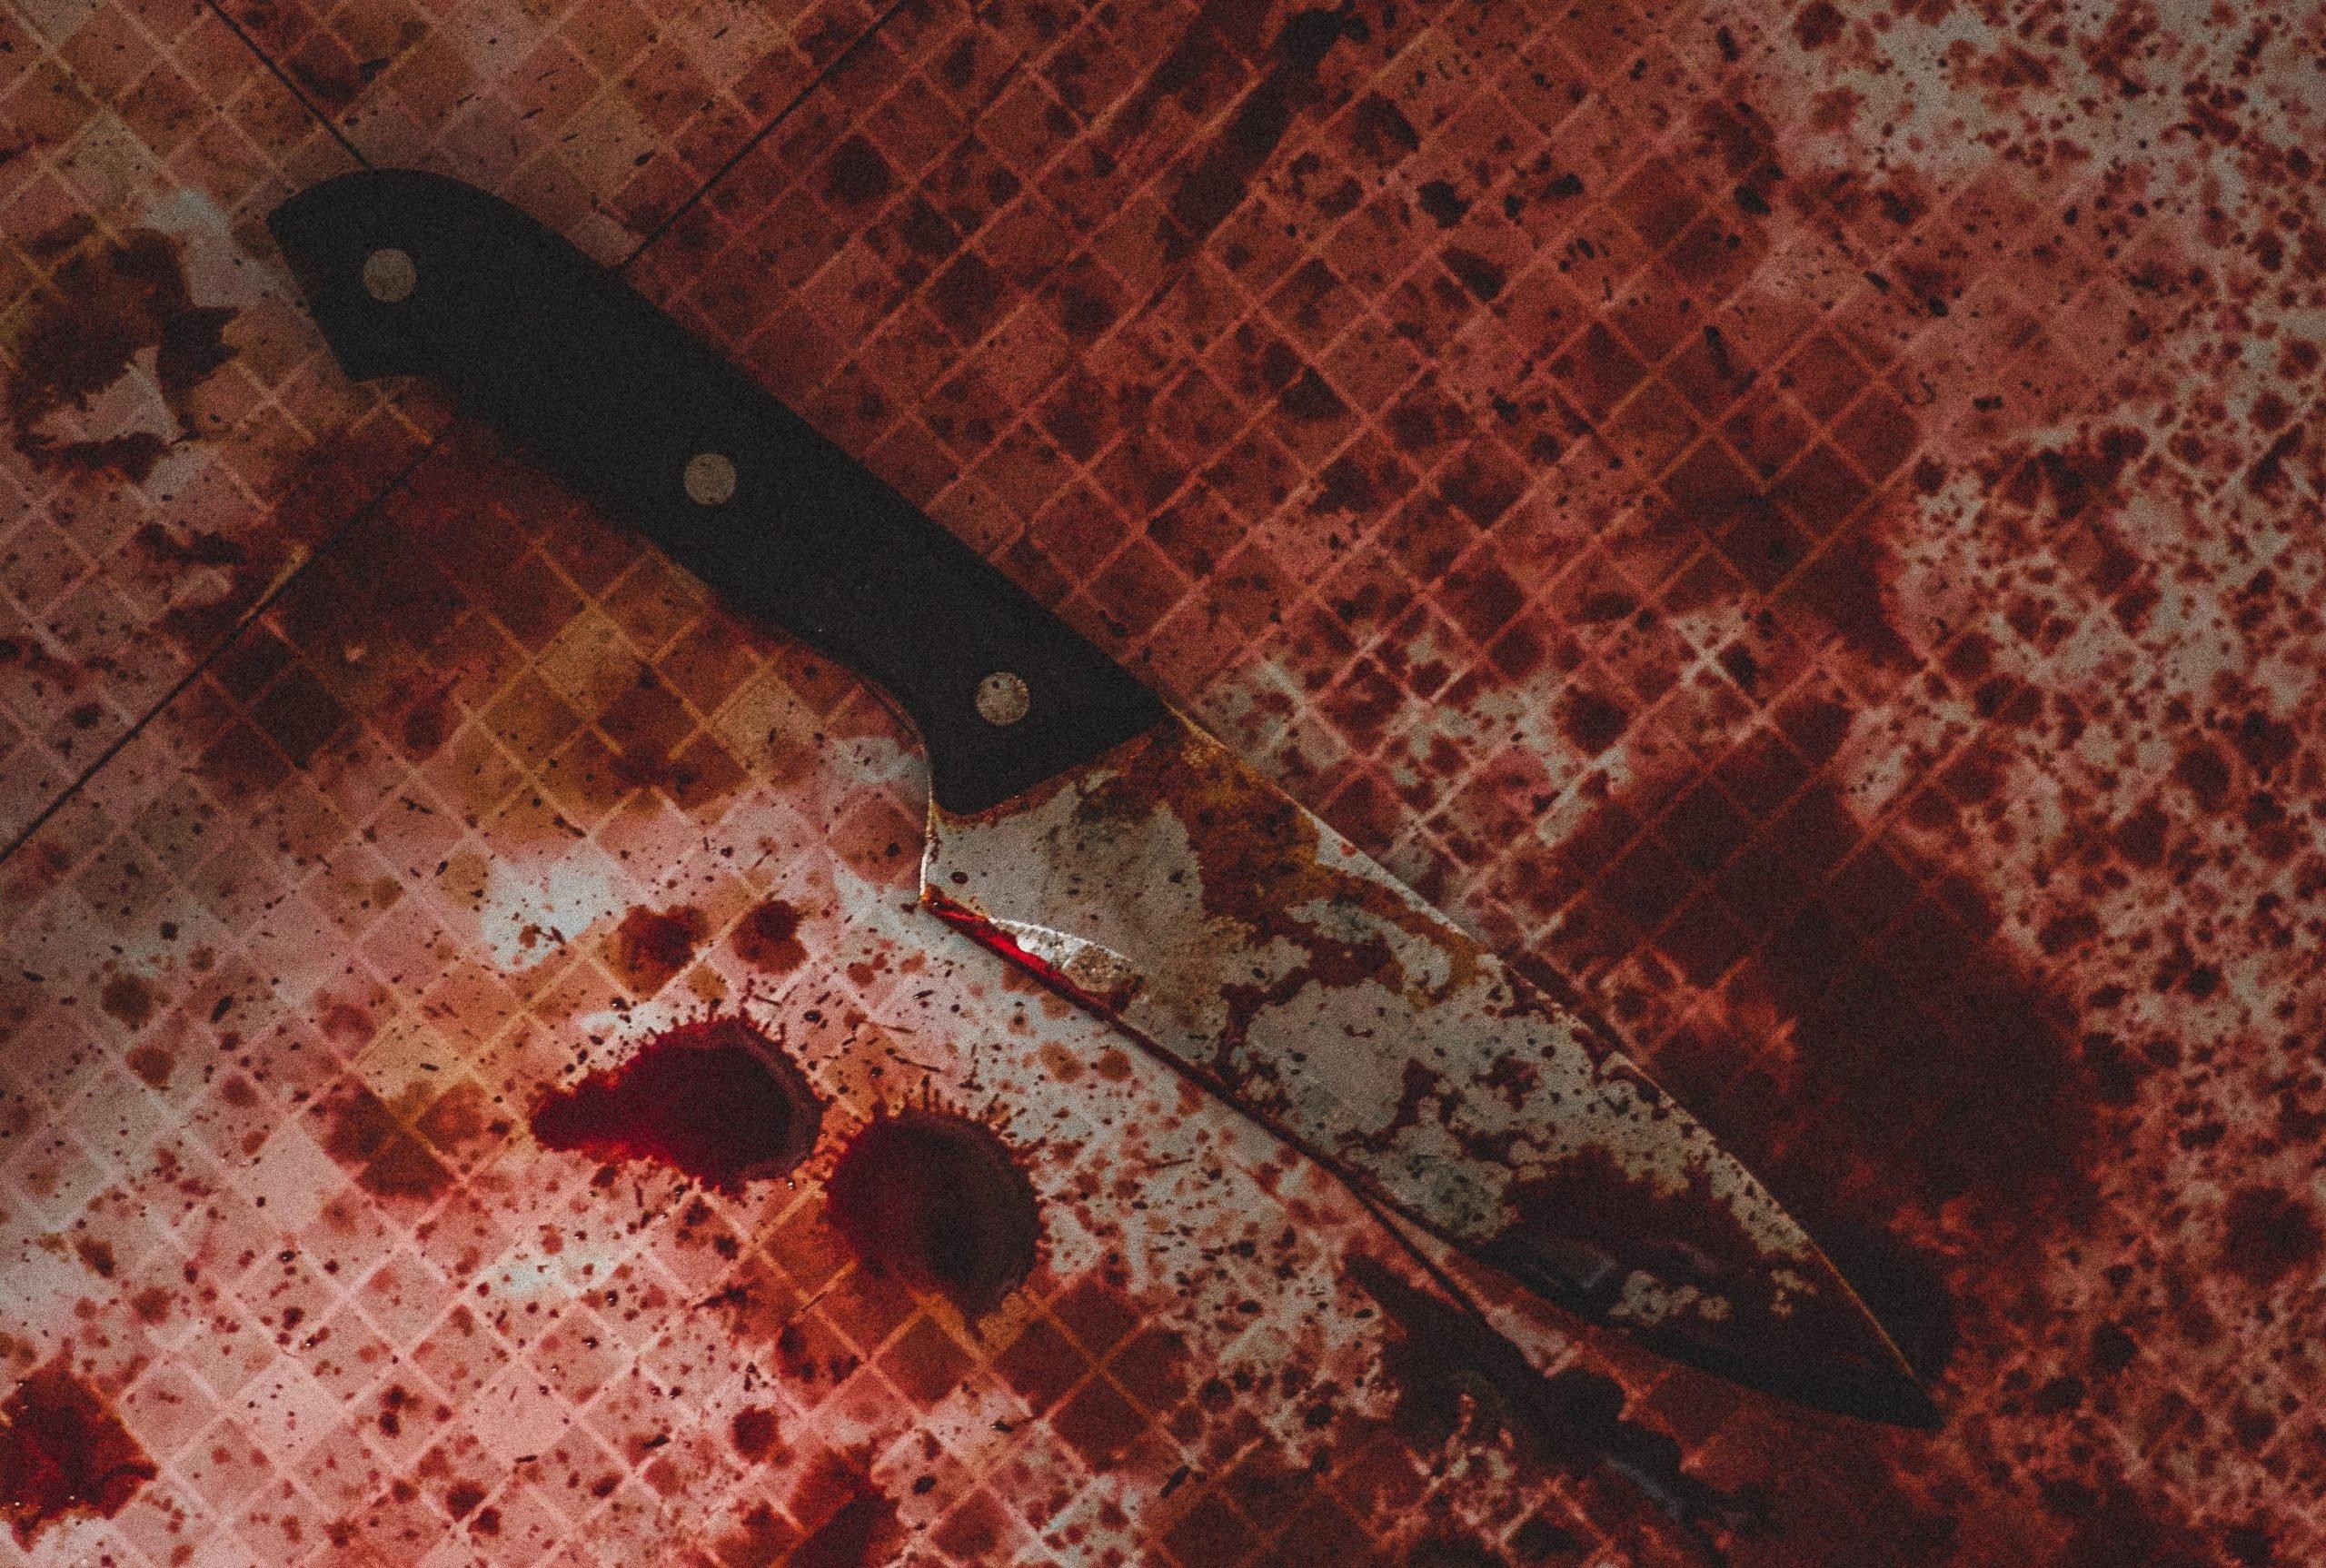 nôž v kaluži krvi